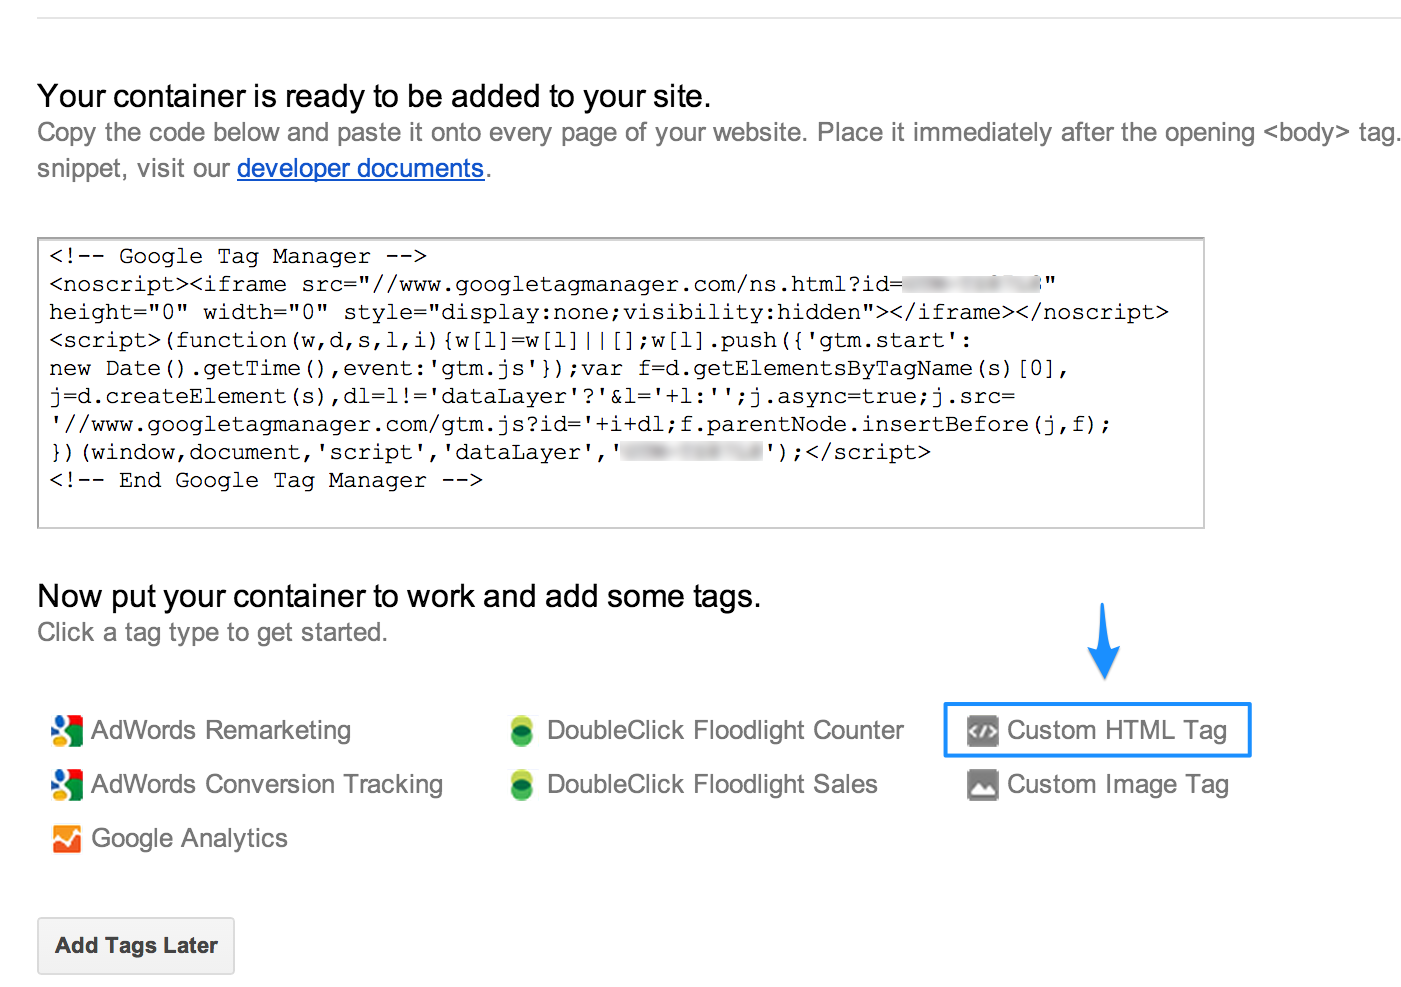 Kissmetrics - Installing Kissmetrics through Google Tag Manager